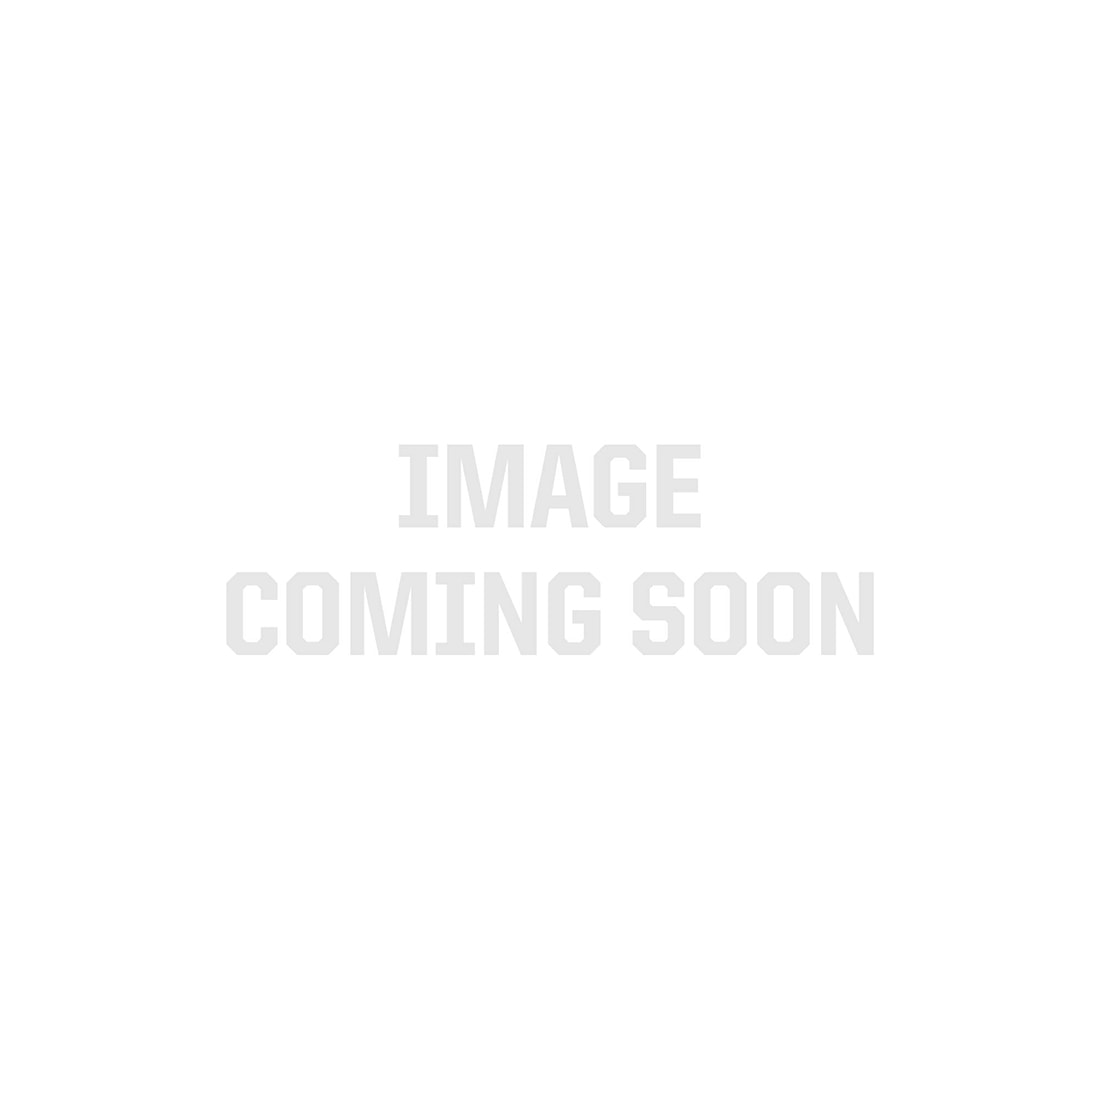 BlackBox F-2 G4 MK2, Transmitter/Receiver. 2.45GHz & 5.8GHz, DMX/RDM, 1024CH